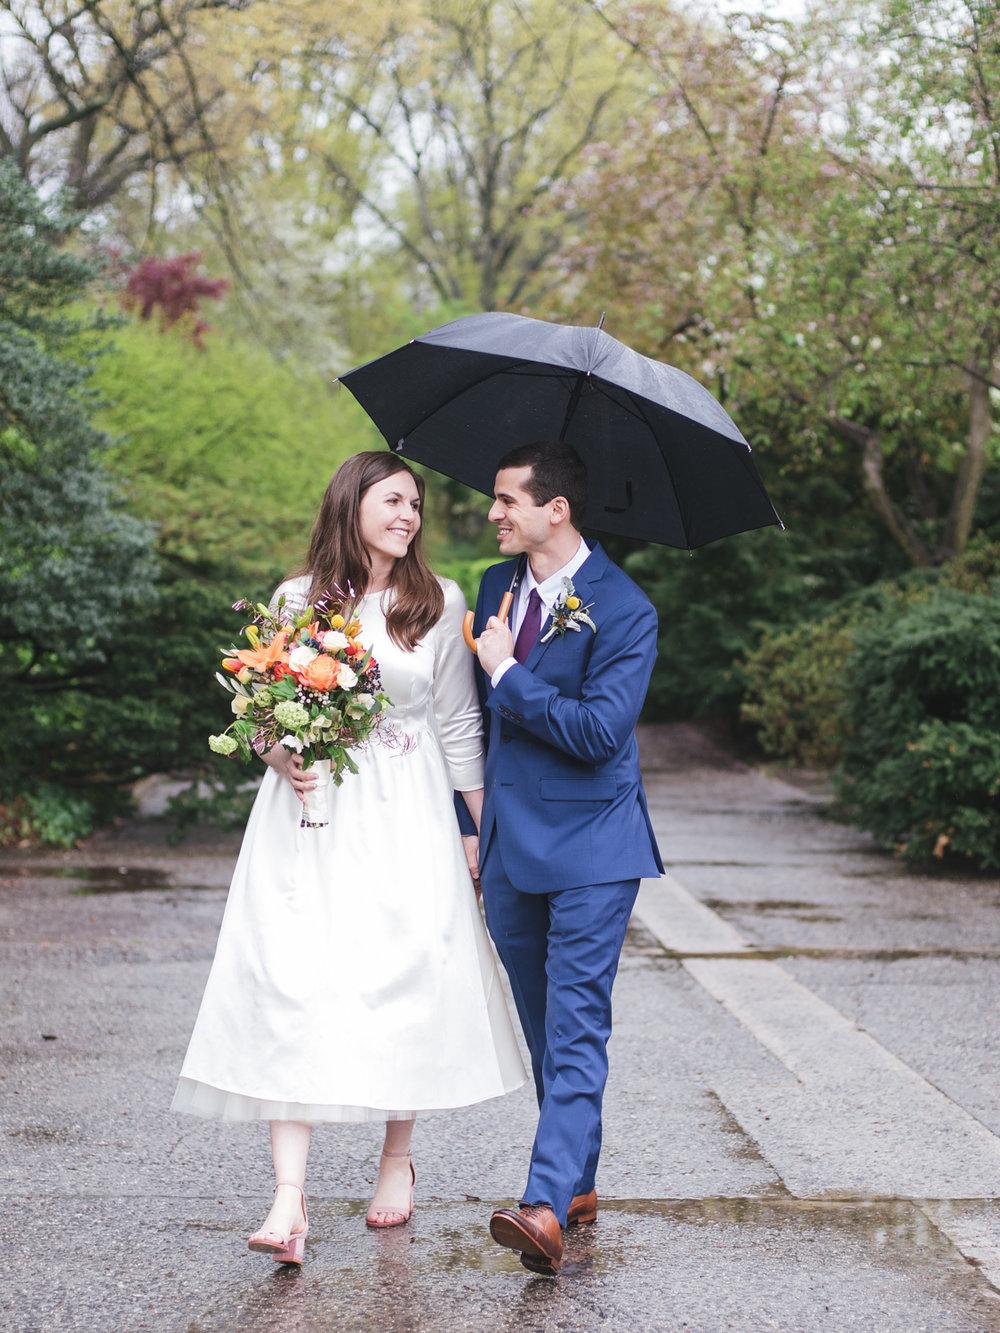 WeddingKatieLorenzo17_MM-1460.jpg